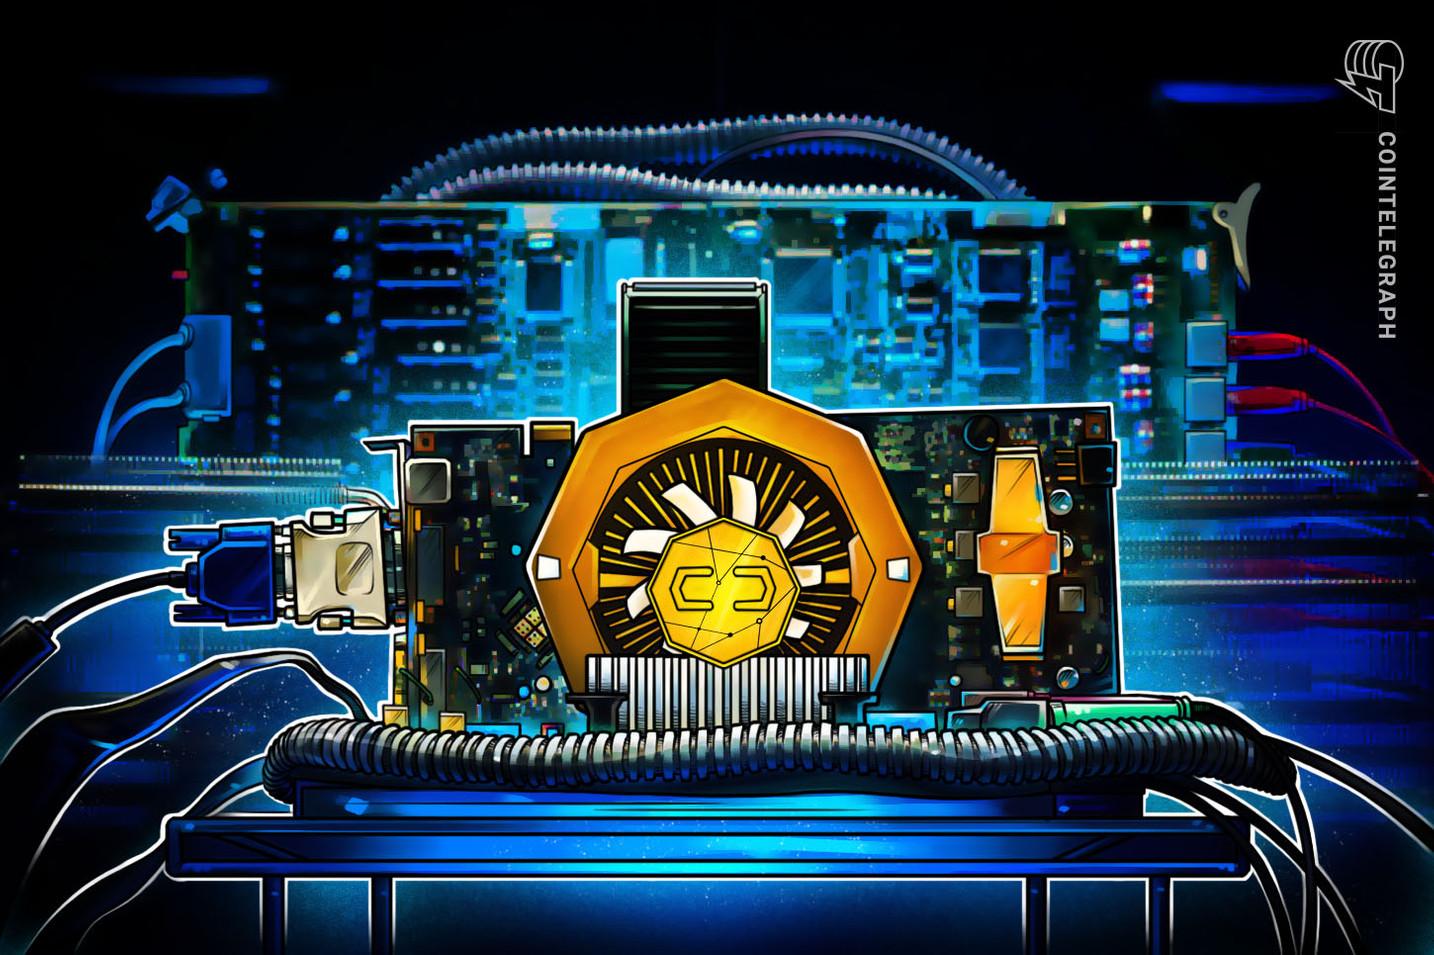 GPU大手のエヌビディア、仮想通貨マイニング需要が増加すれば専用製品の製造再開も